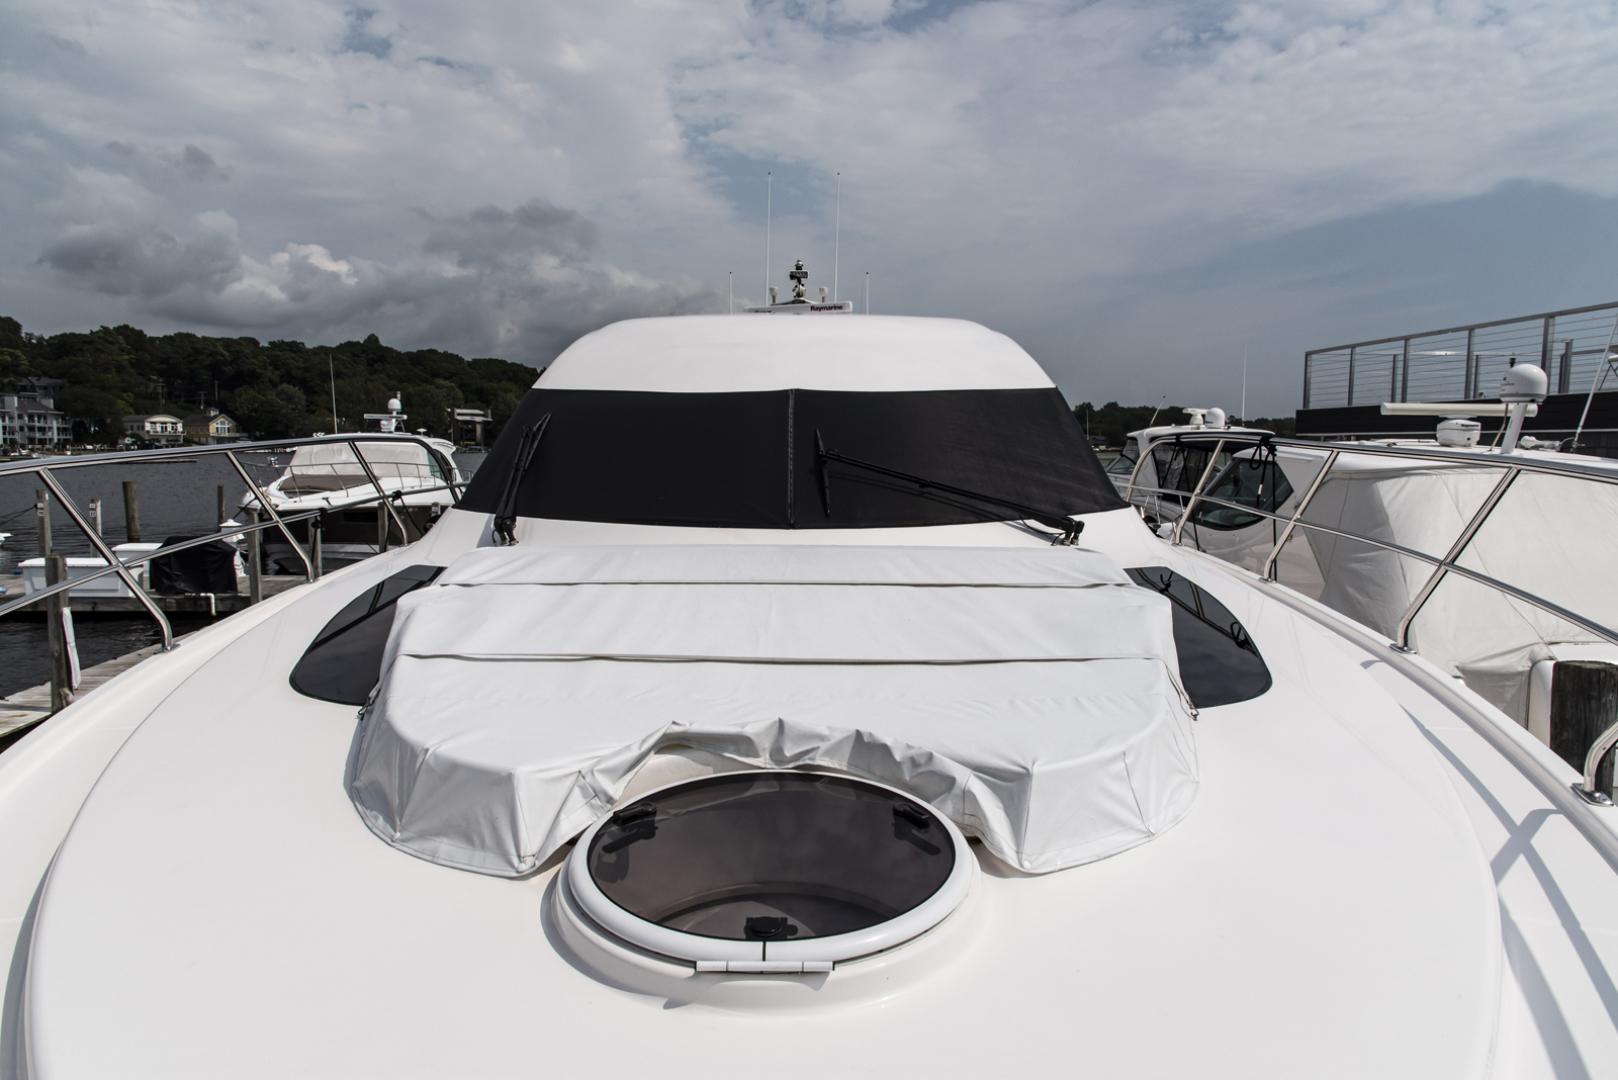 Neptunus-Motor Yacht Express 2018-LIQUID WISDOM Grand Haven-Michigan-United States-Bow-1485000 | Thumbnail